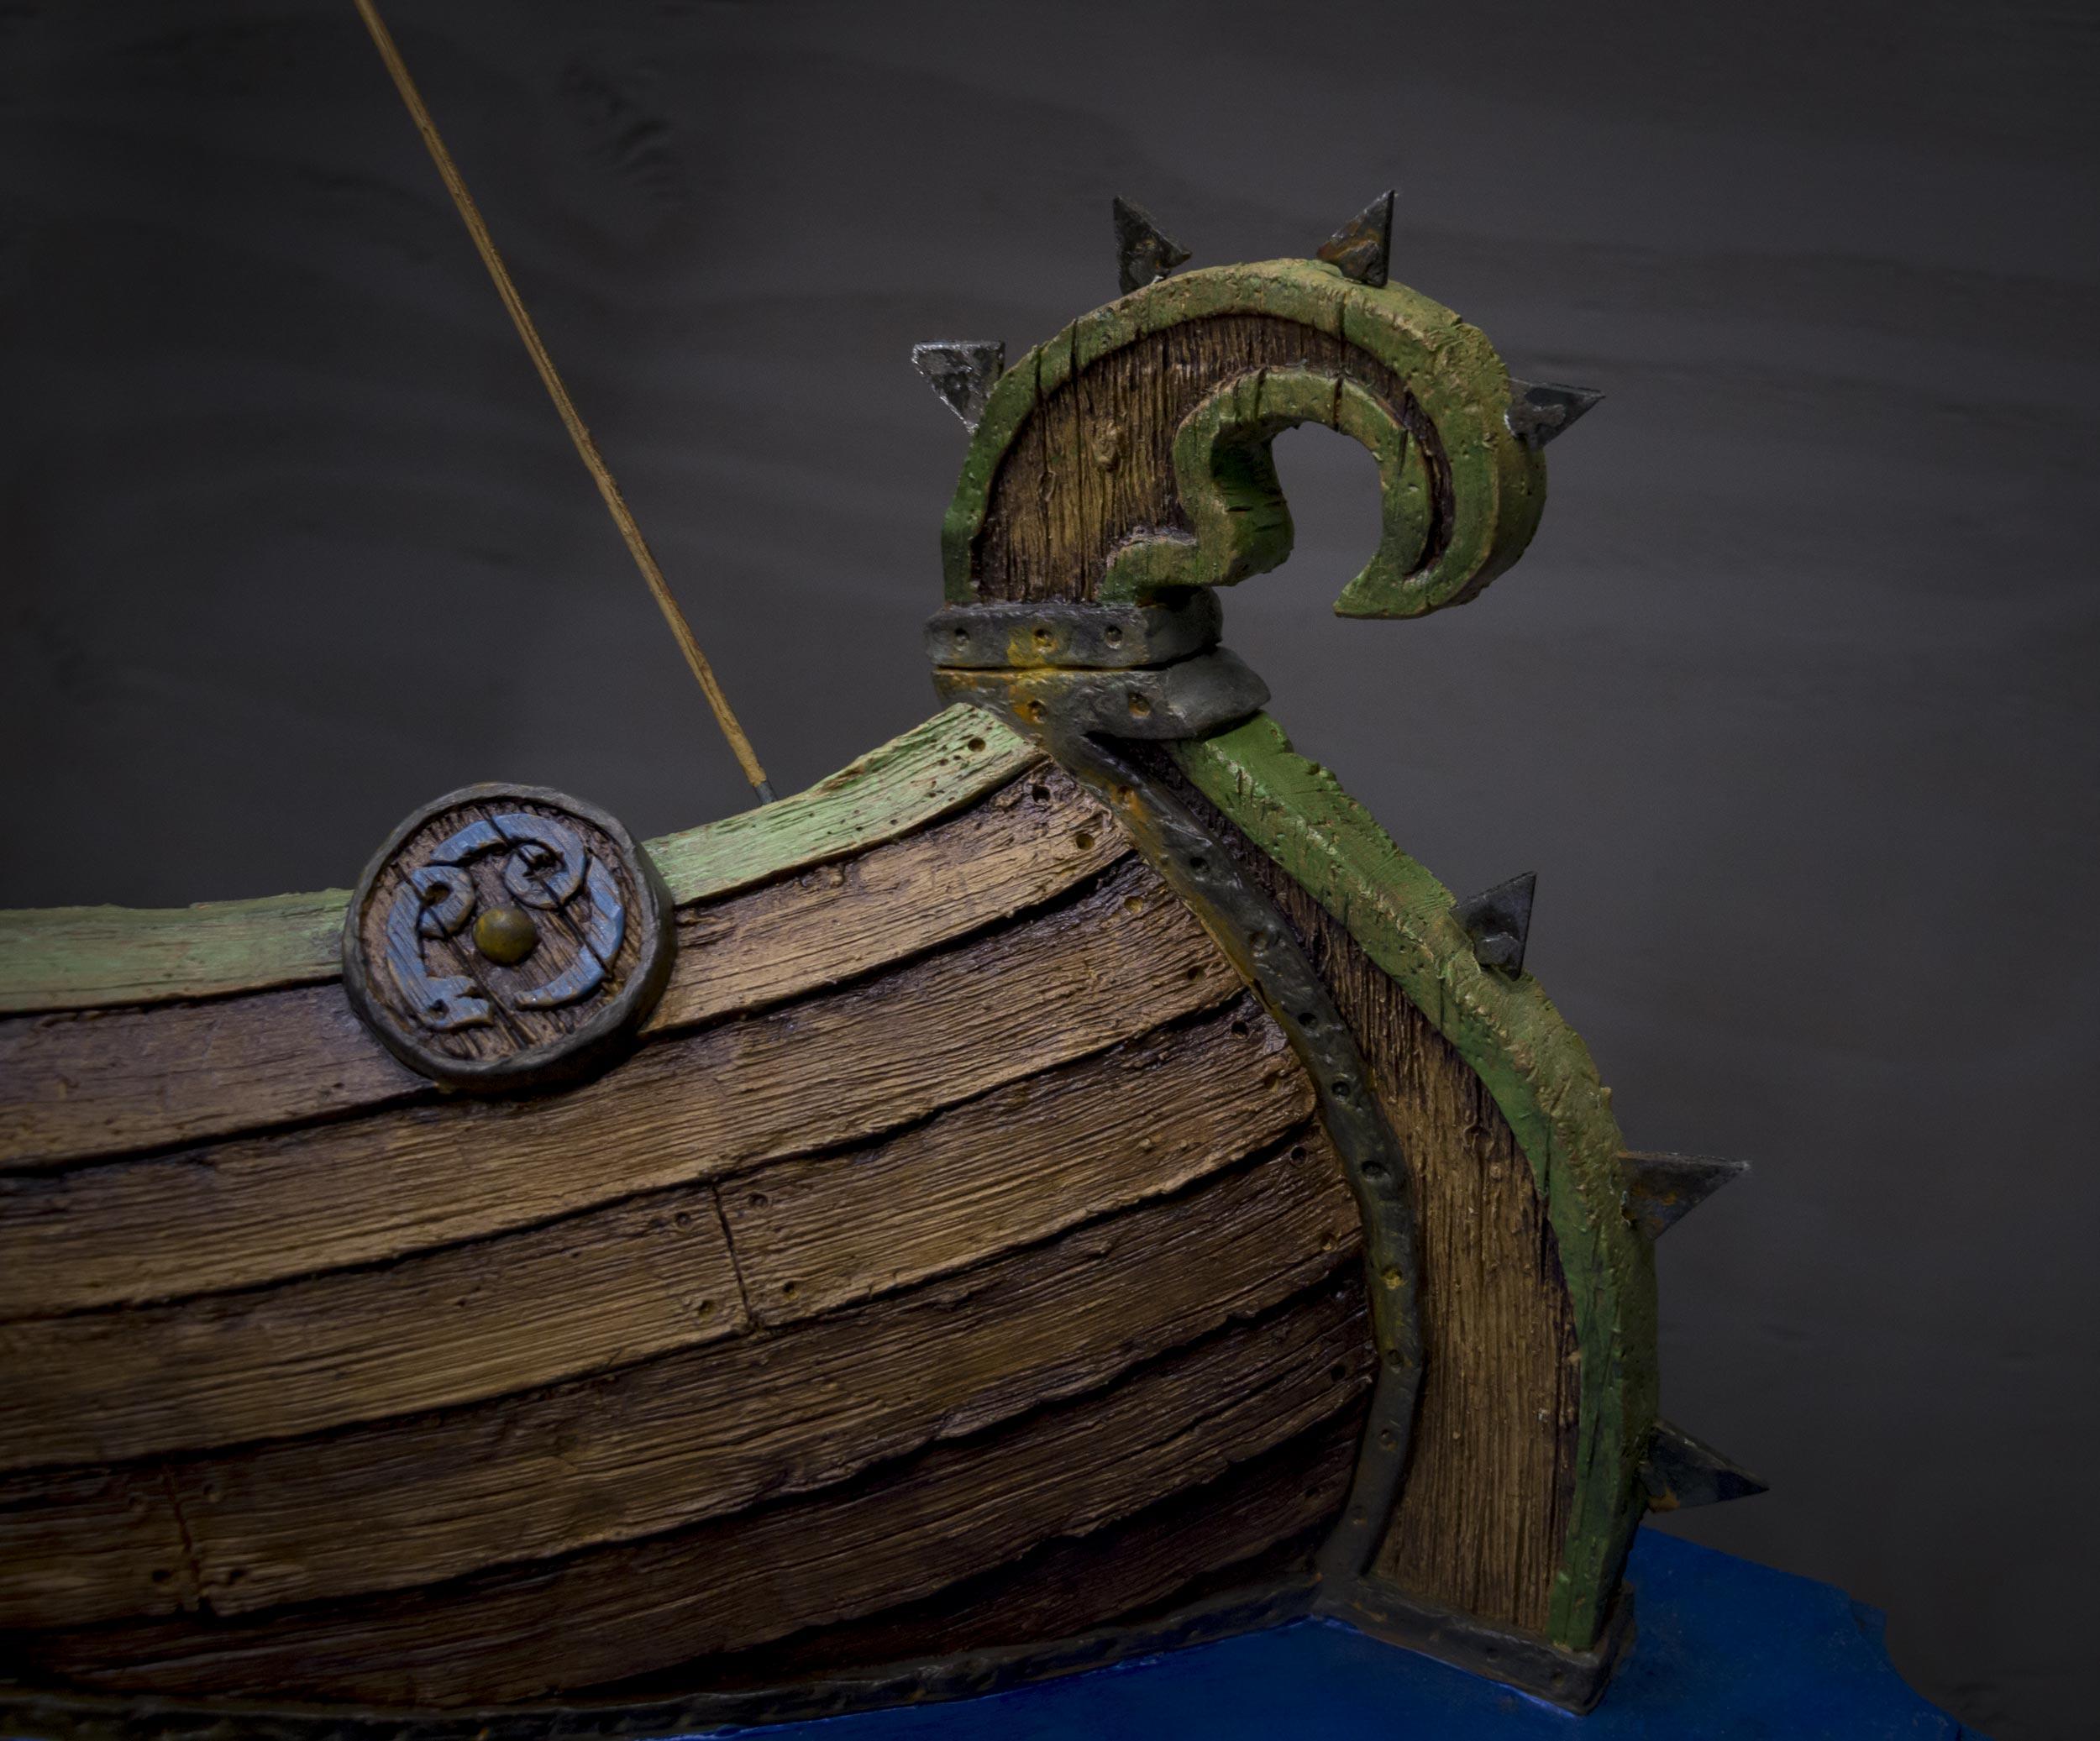 viking-ship-model-4.jpg